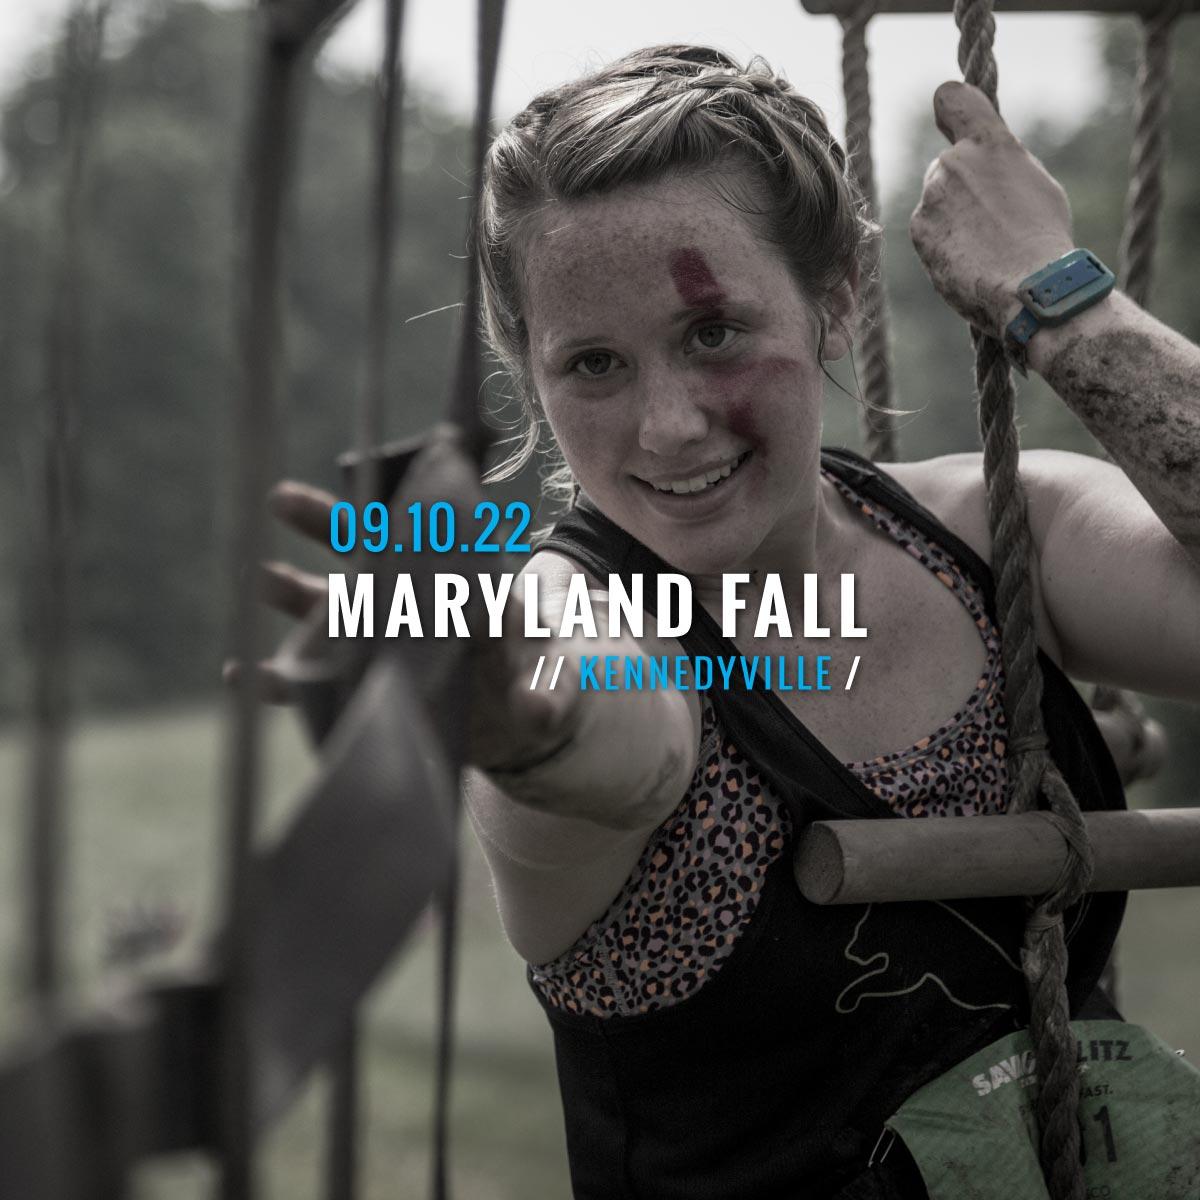 Spectator Pass - Savage Race Maryland Fall 2022